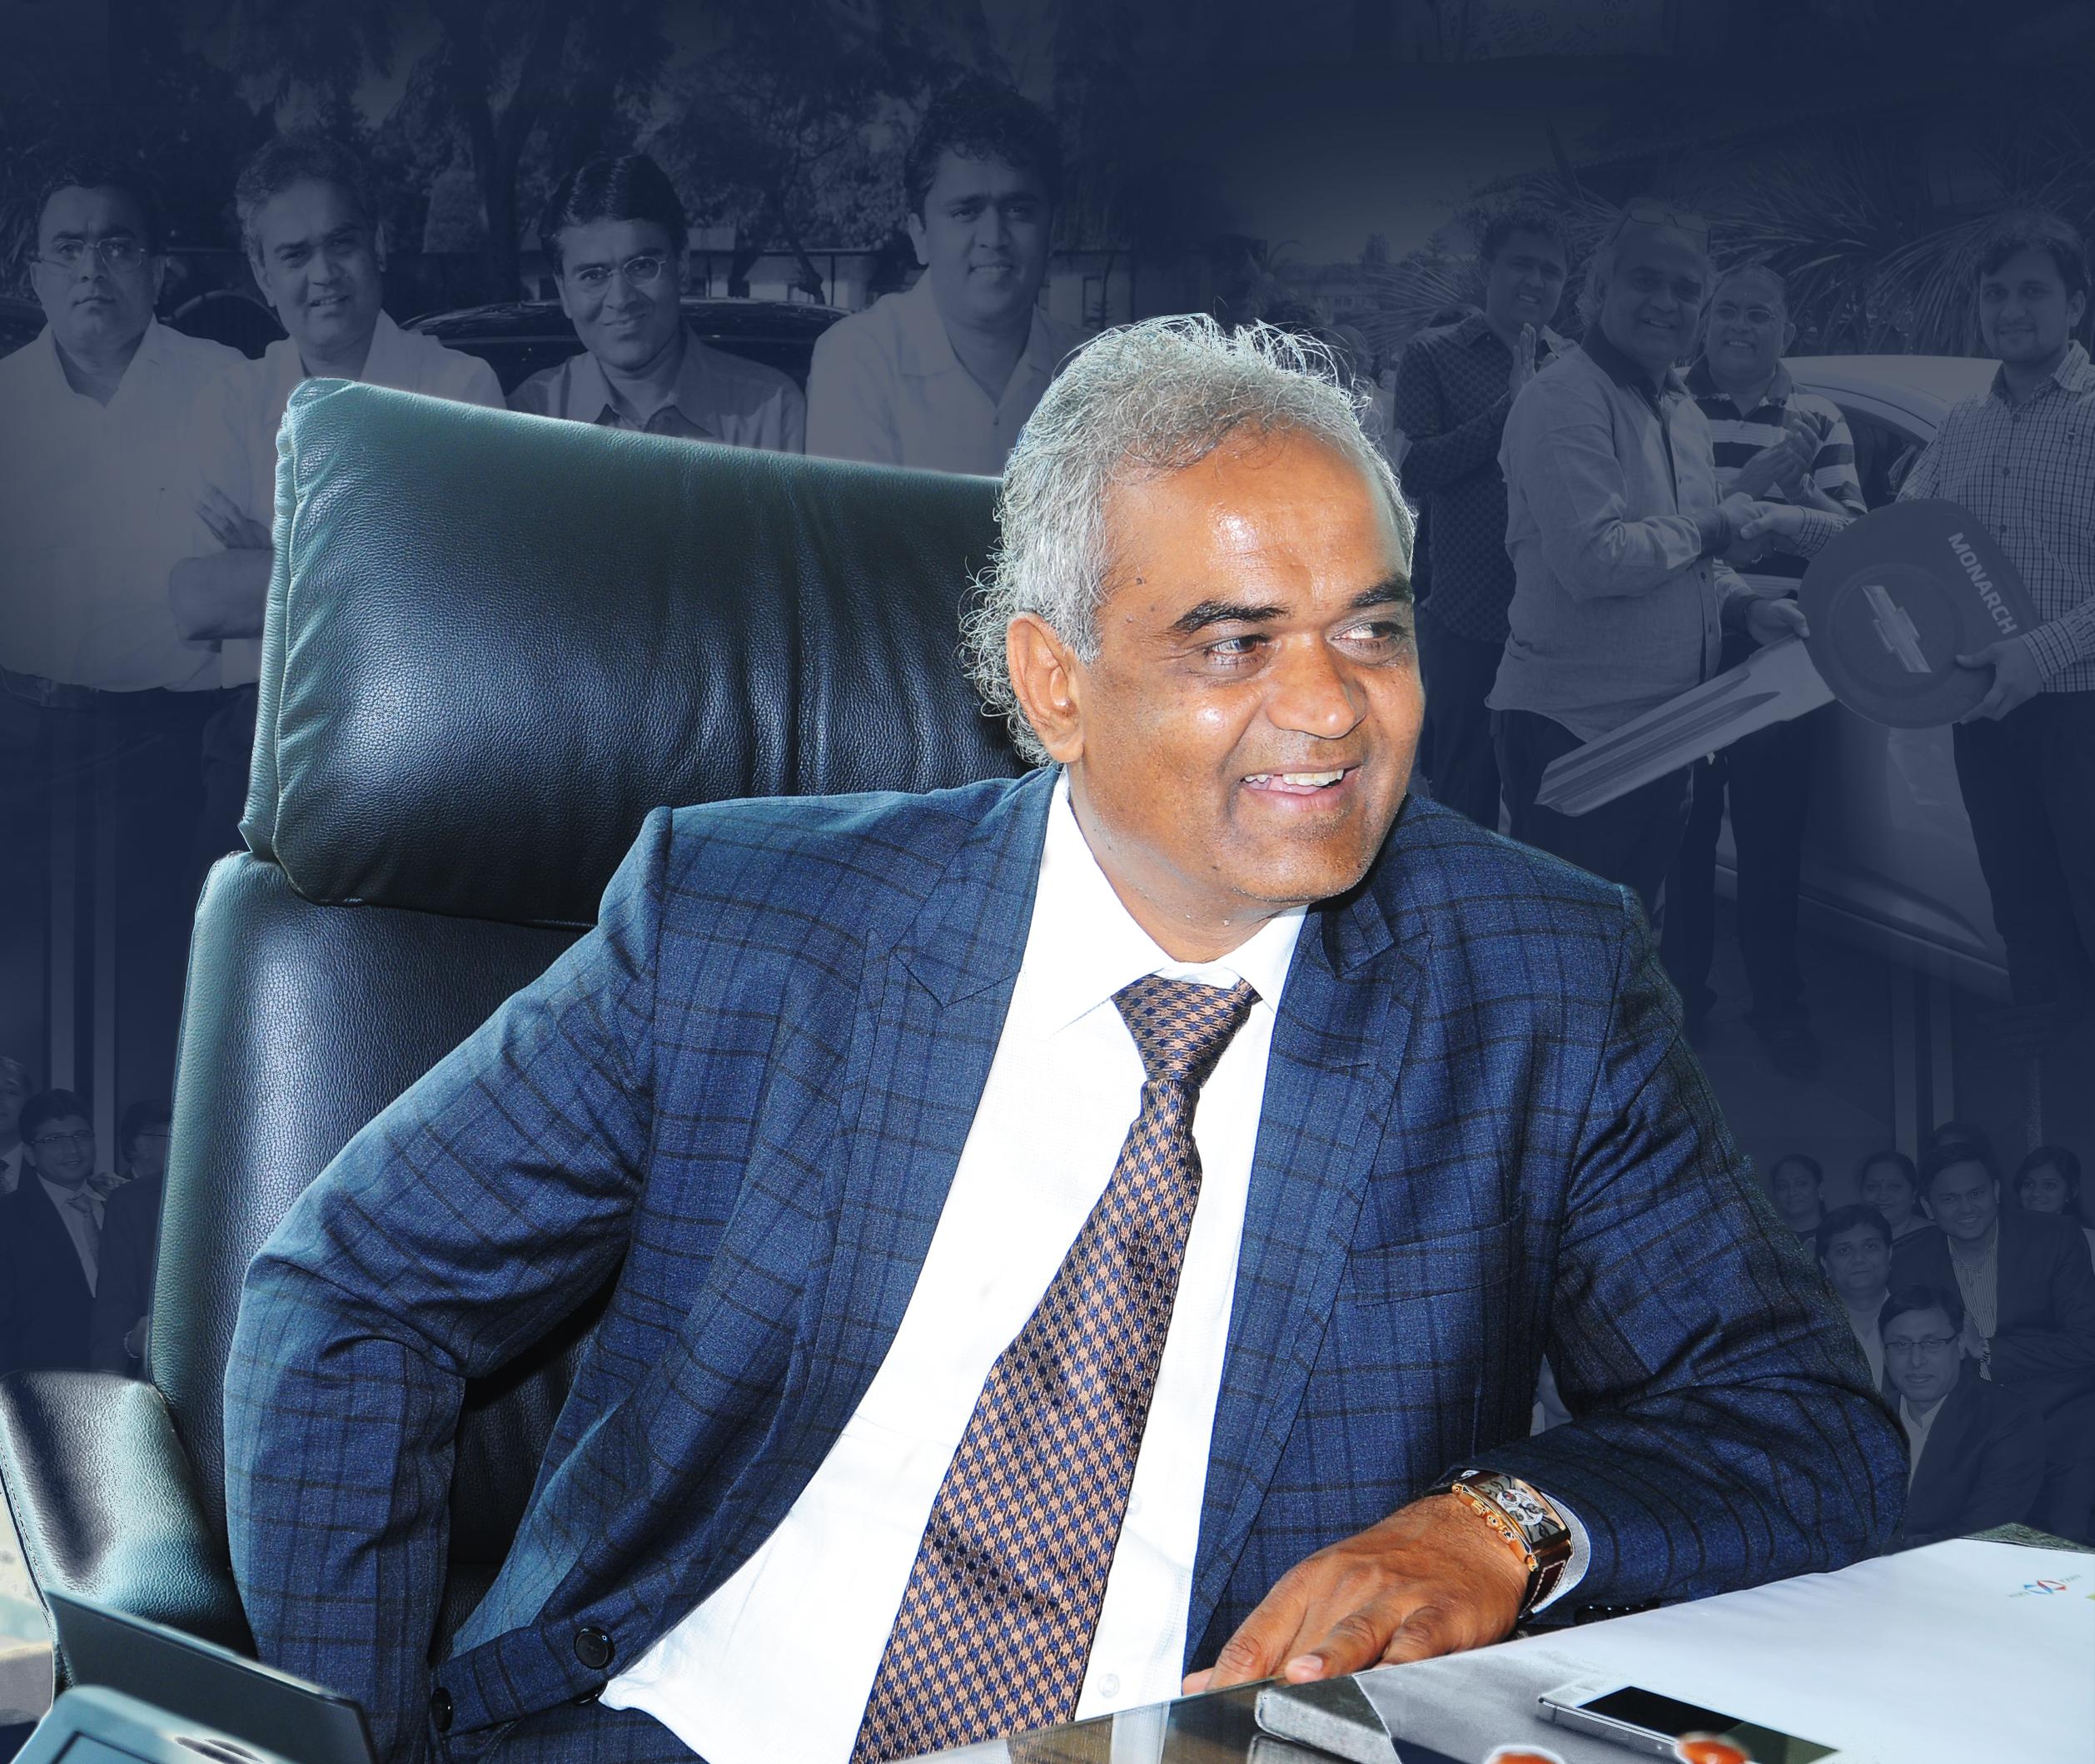 El señor Savji Dholakia Hari, fundador y presidente de Krishna Exports Pvt. Ltd